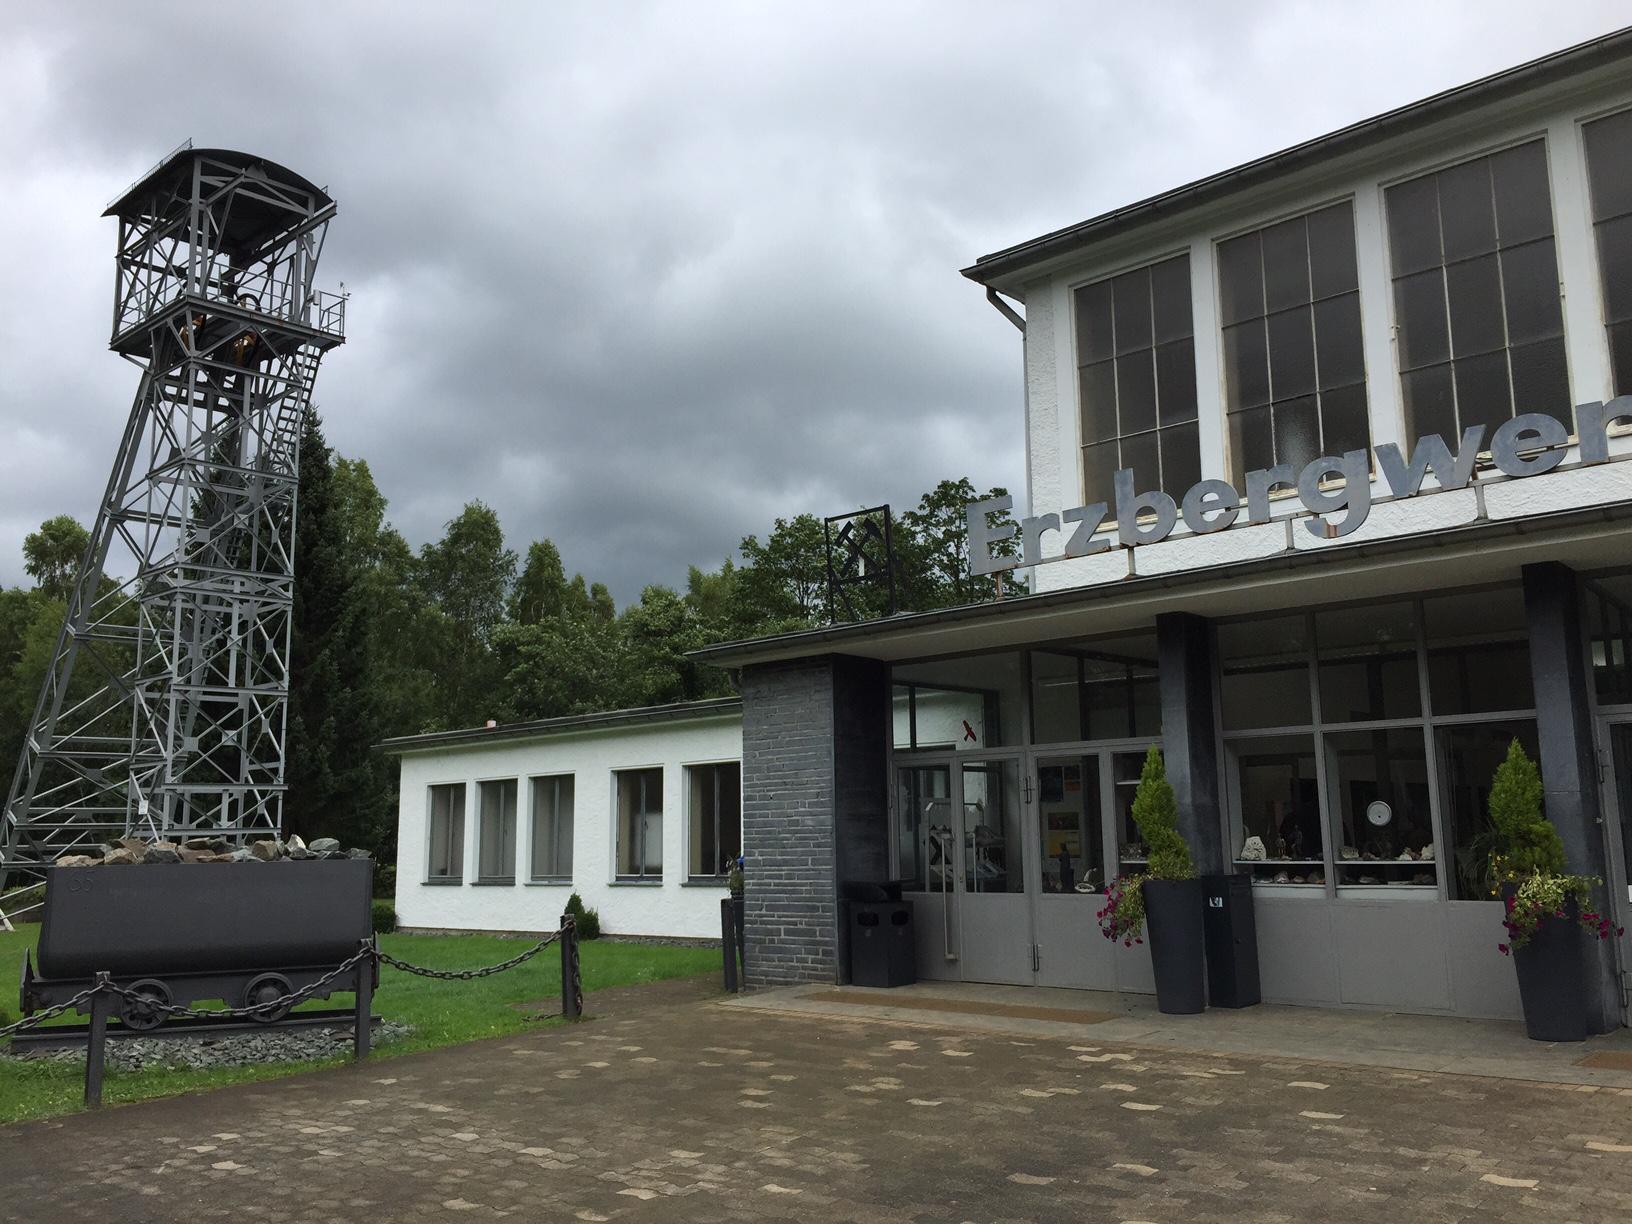 17 september 2015 Ramsbeck – Brilon